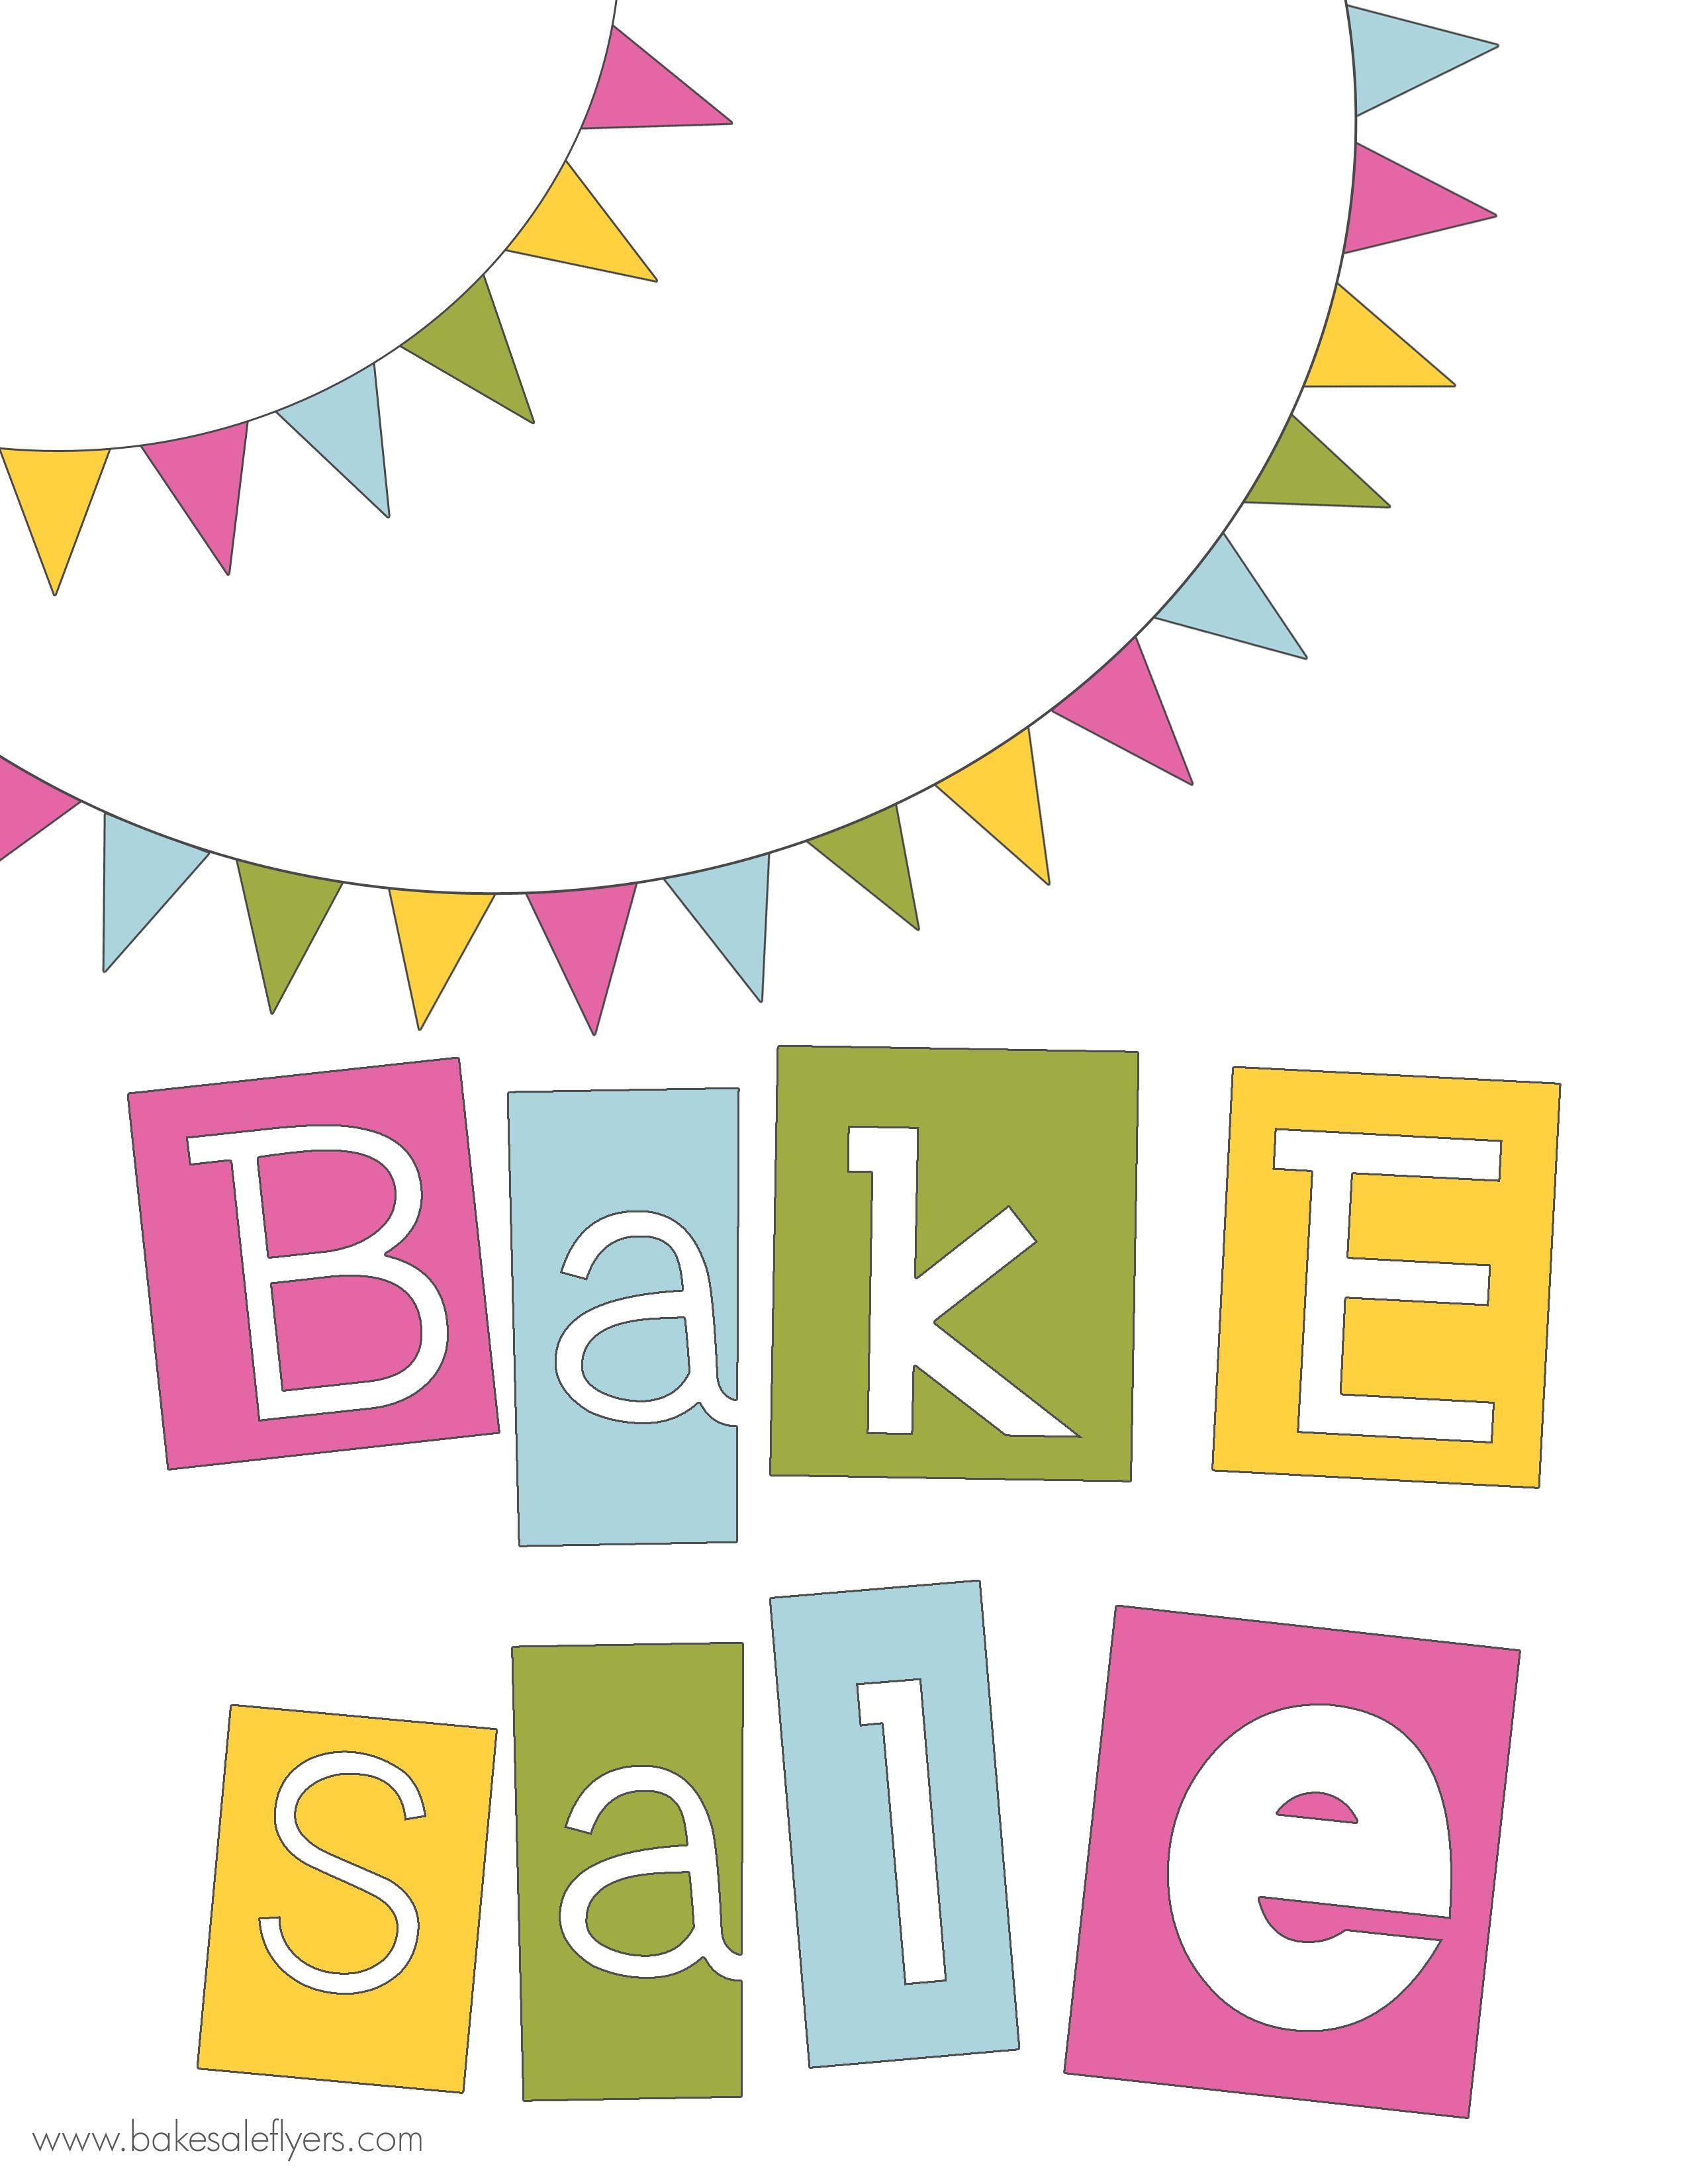 Free Printable Bake Sale Banner   Bake Sale Ideas   Pinterest   Bake - Free Printable Flyers